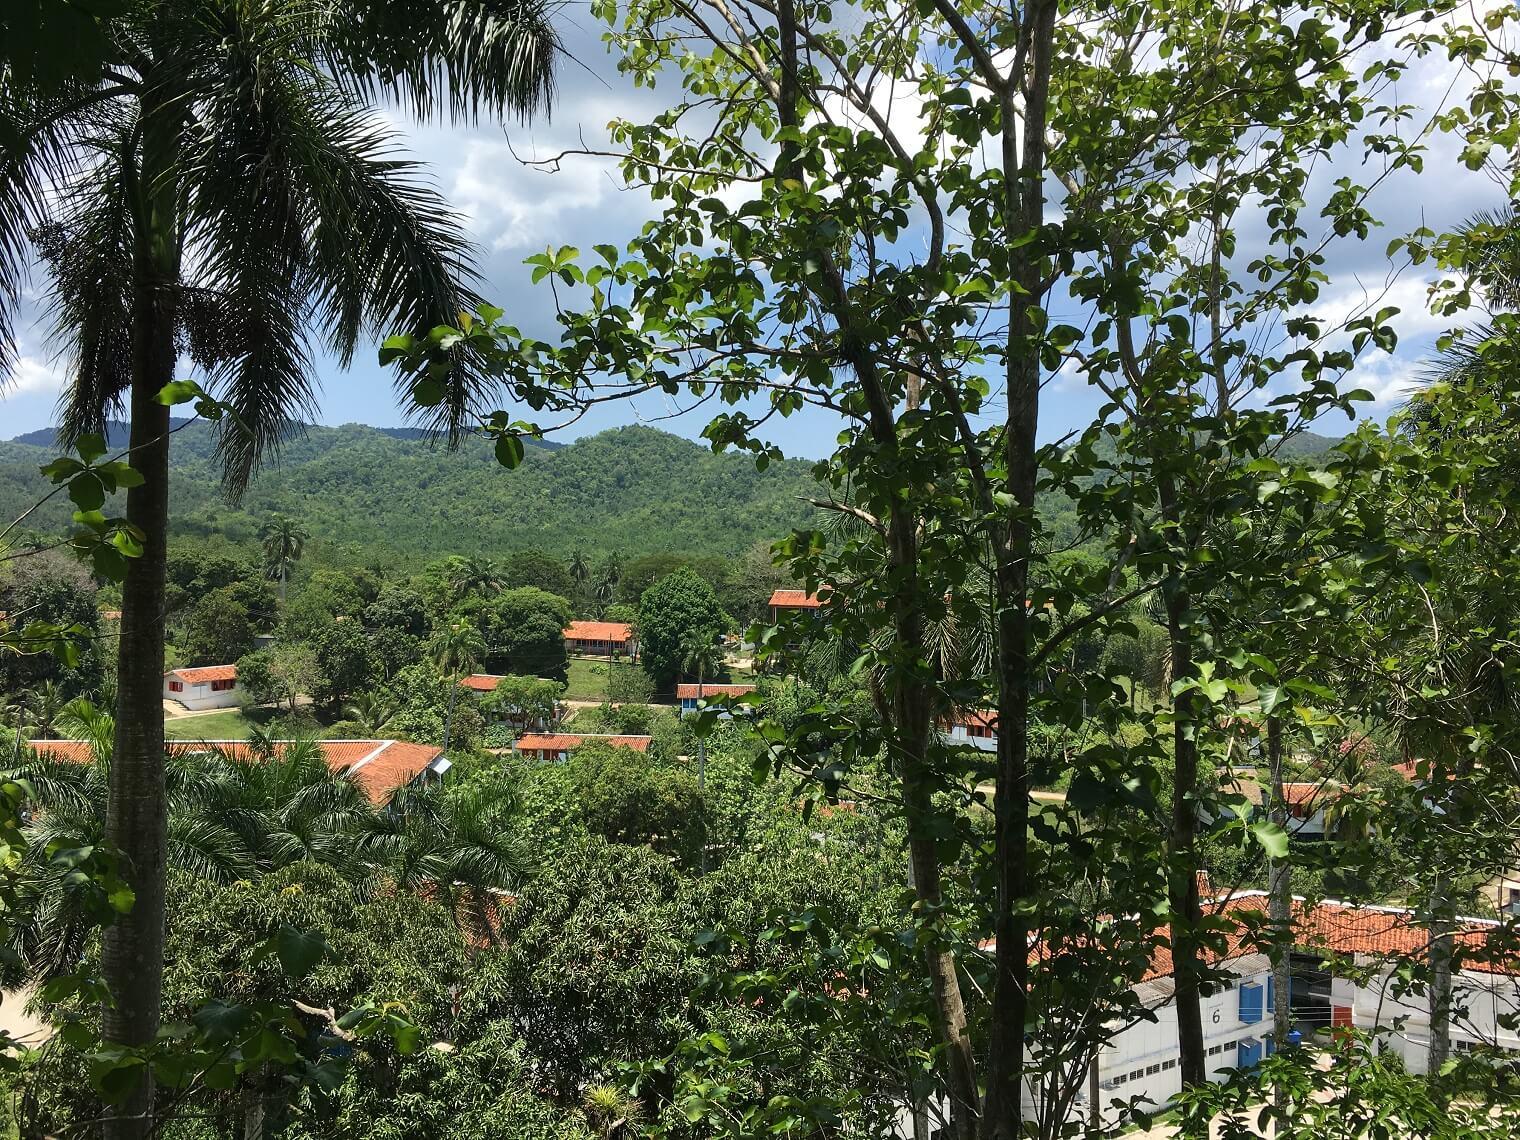 Beautiful forest view of Las Terrazas from the Hotel Moka balcony